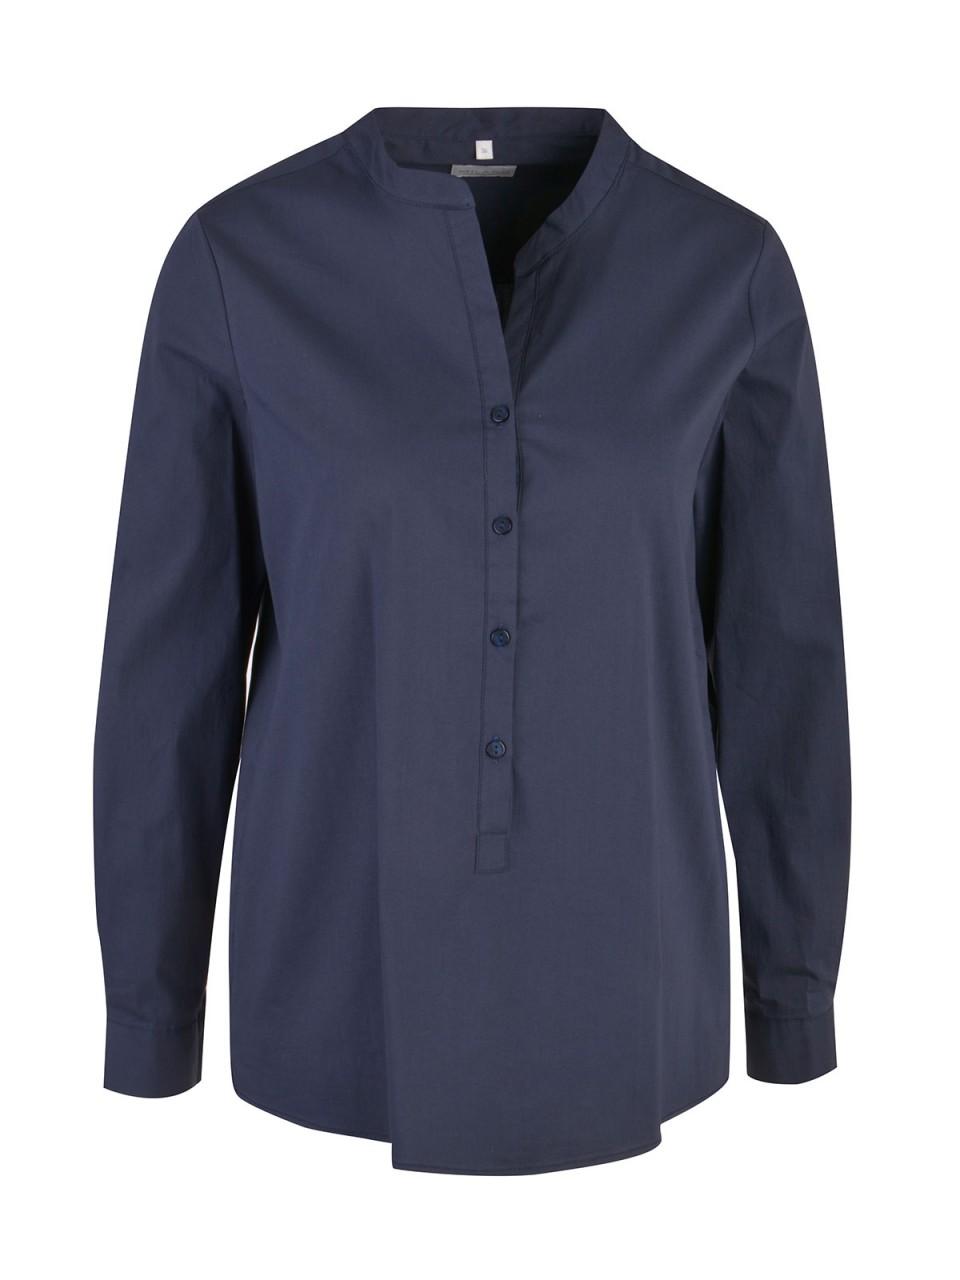 Oberteile - MILANO ITALY Damen Bluse, navy  - Onlineshop Designermode.com